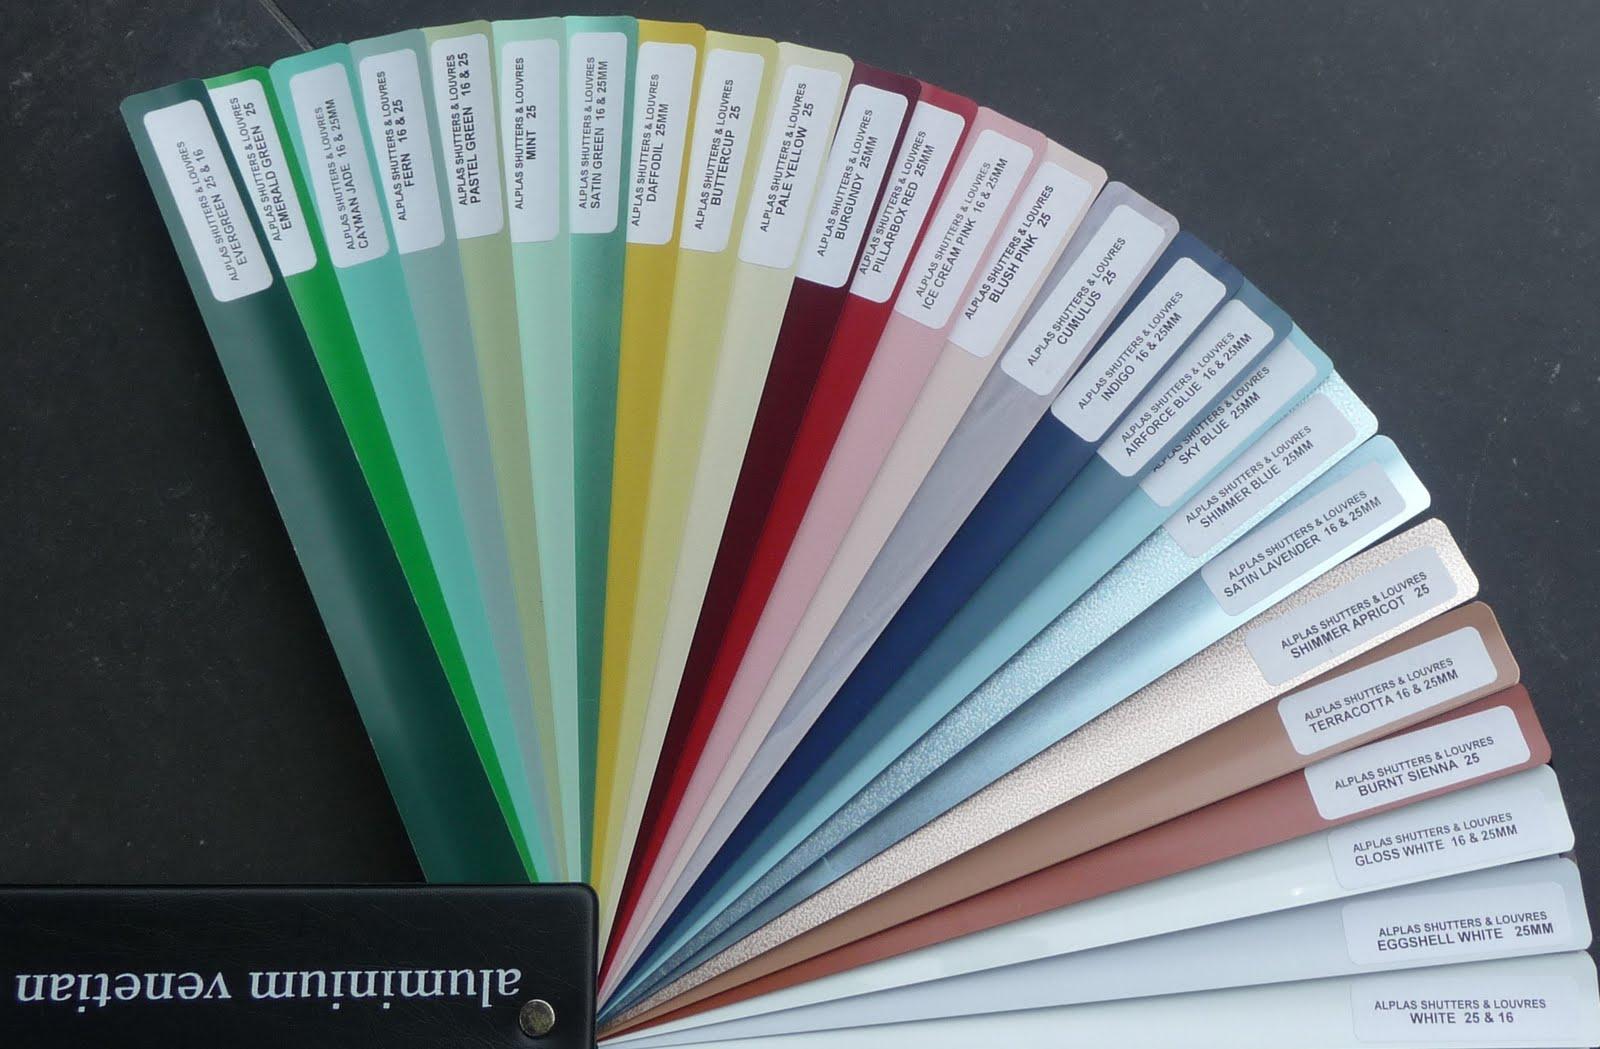 Alplas Blinds Louvres Aluminium Venetian Blind Colour Range From